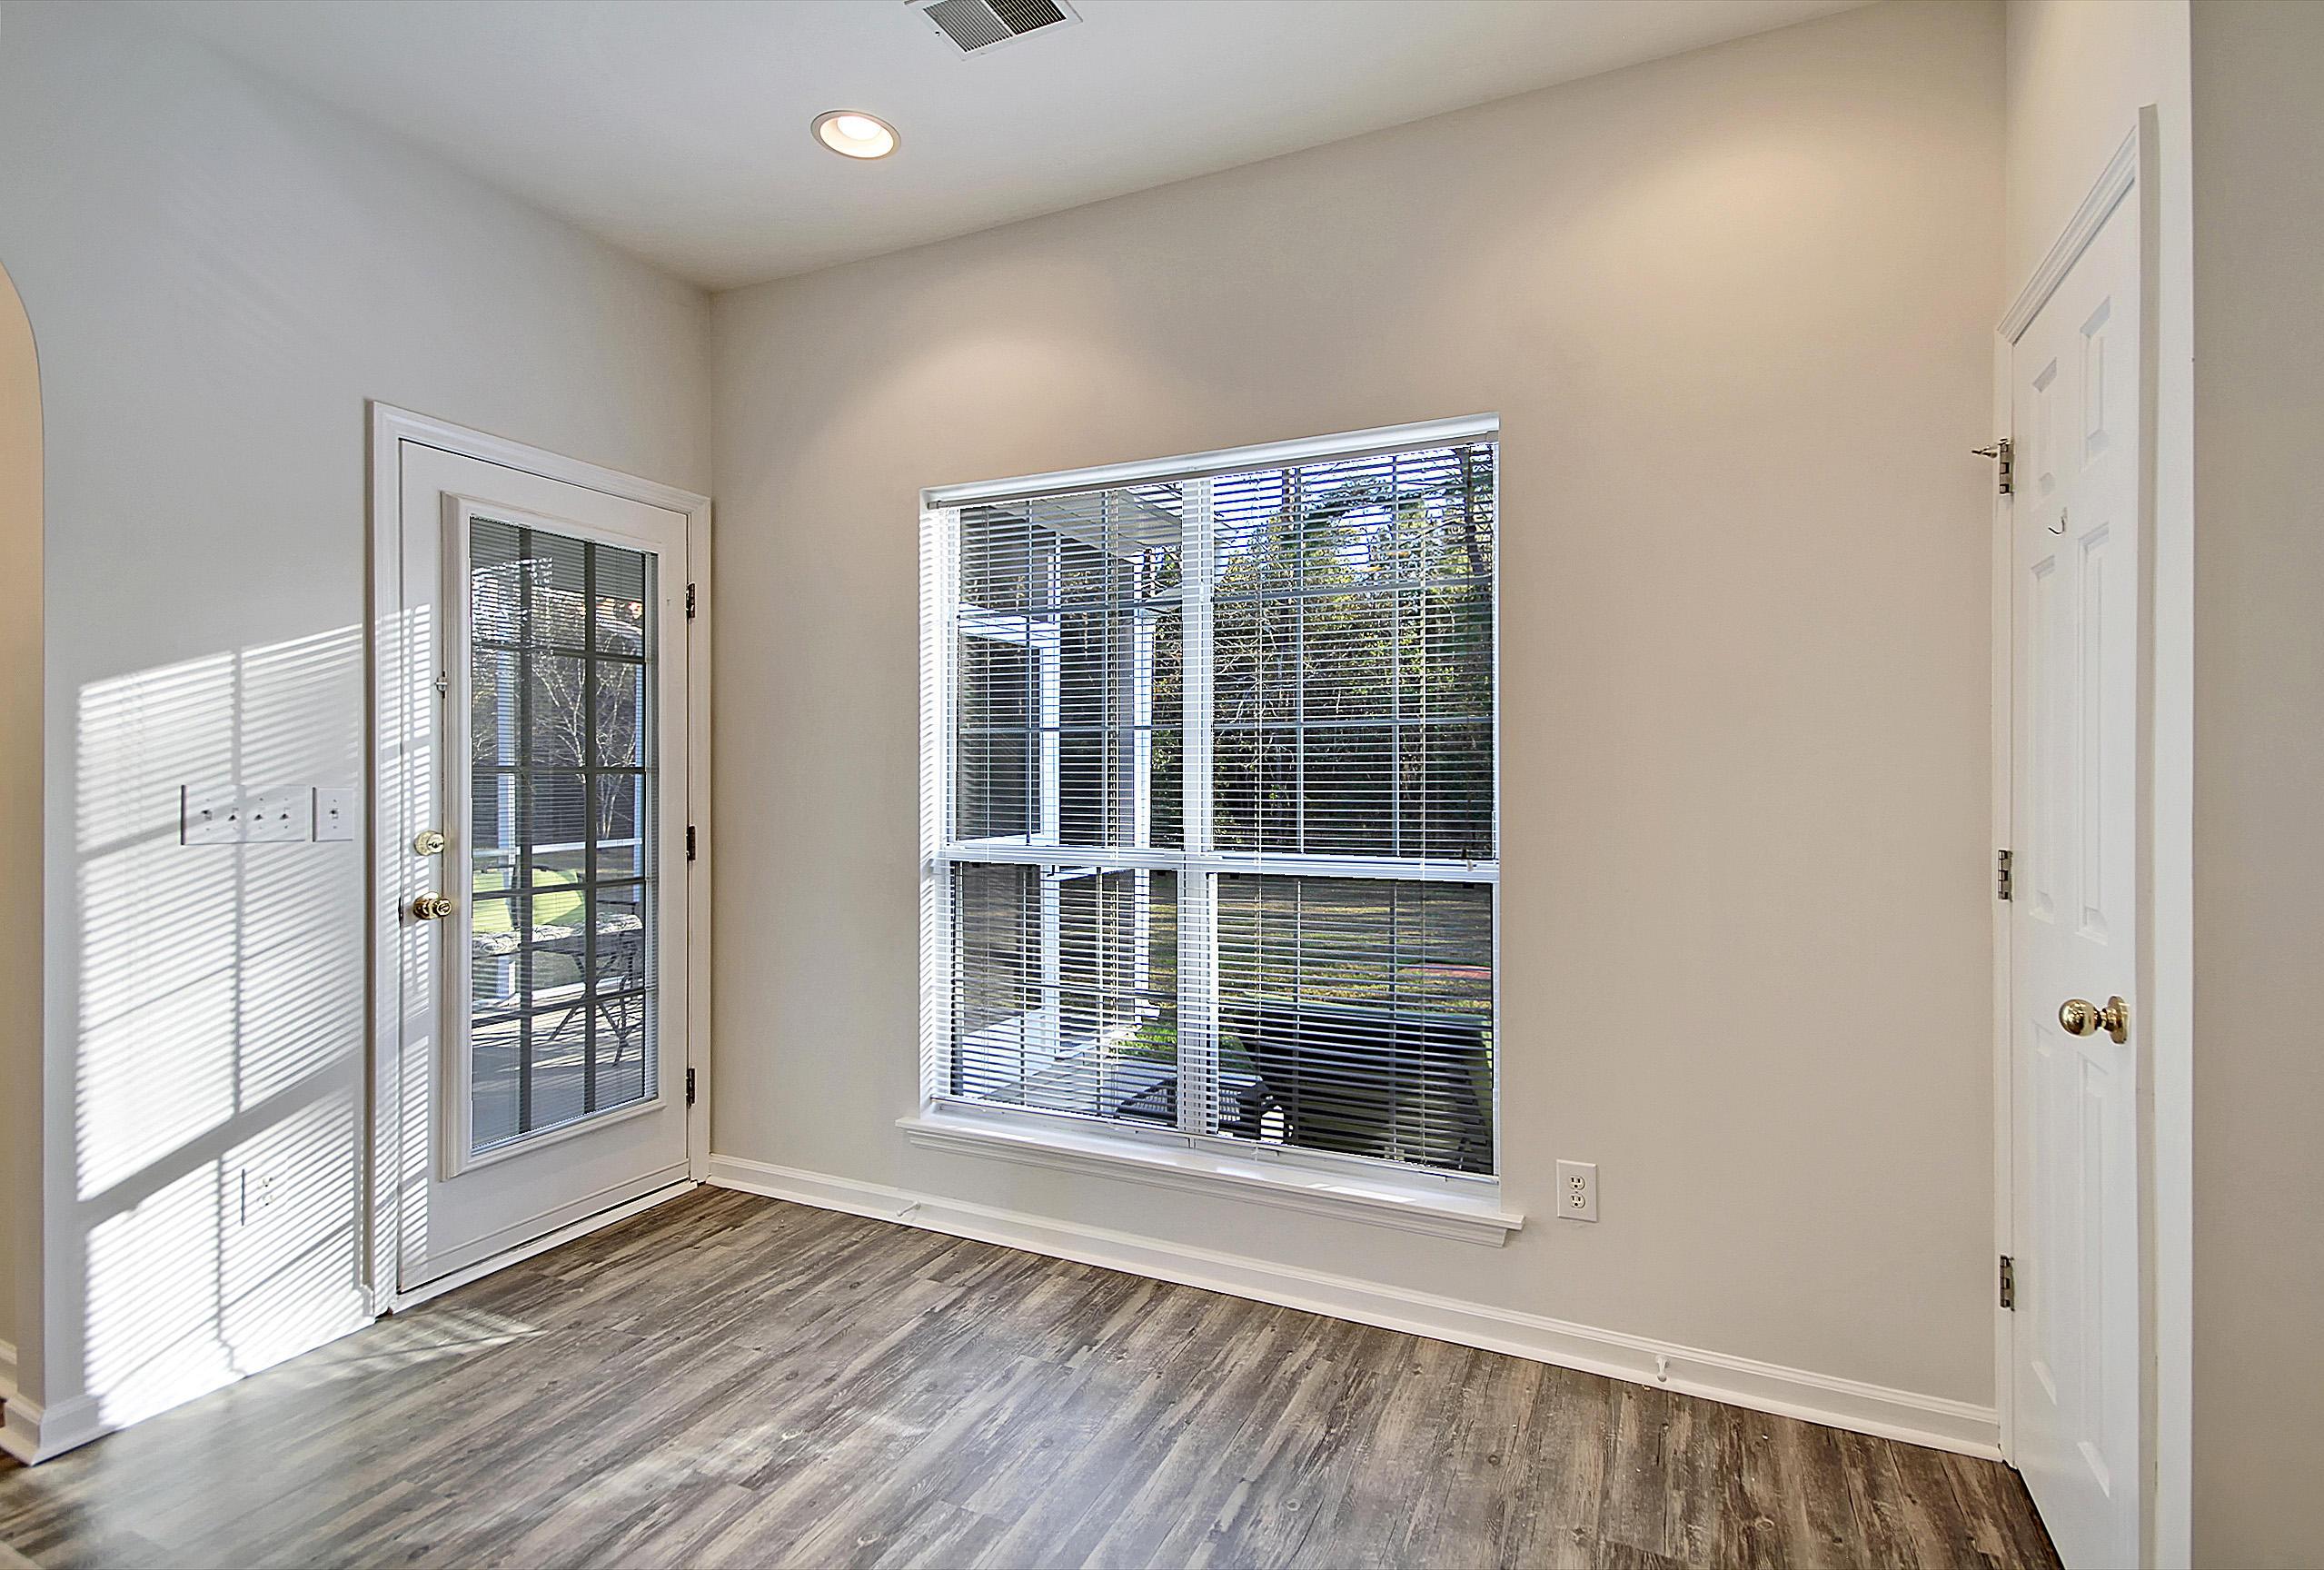 Dunes West Homes For Sale - 2656 Palmetto Hall, Mount Pleasant, SC - 1